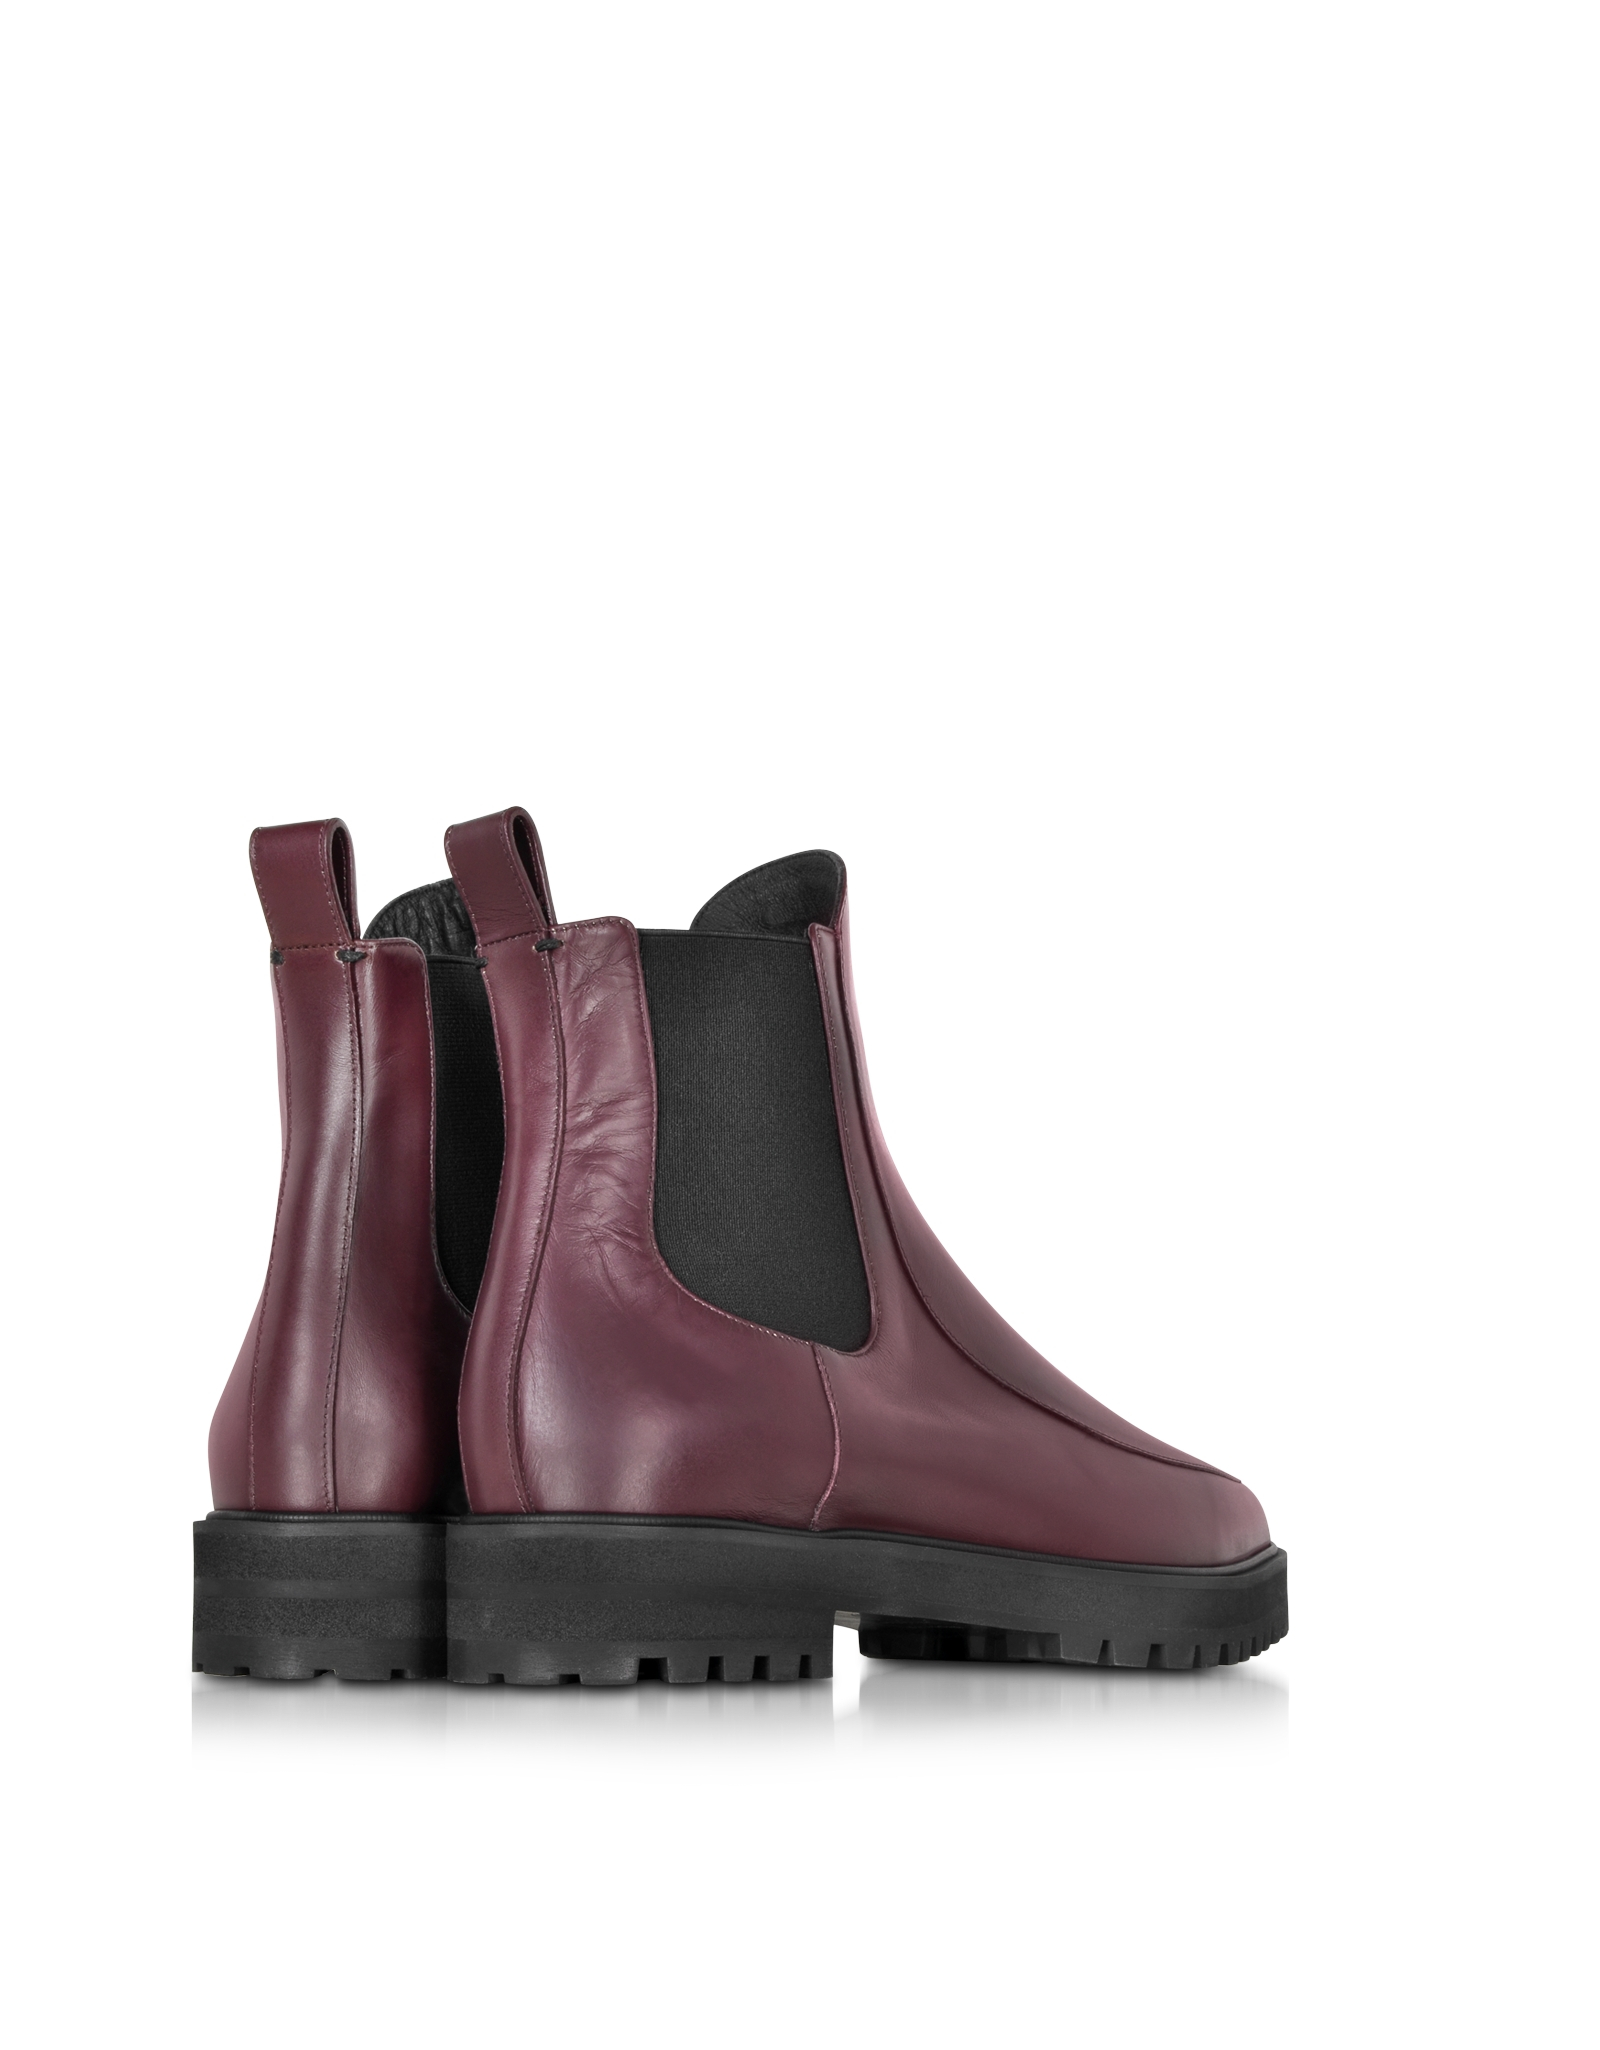 proenza schouler bordeaux leather ankle boot in purple lyst. Black Bedroom Furniture Sets. Home Design Ideas